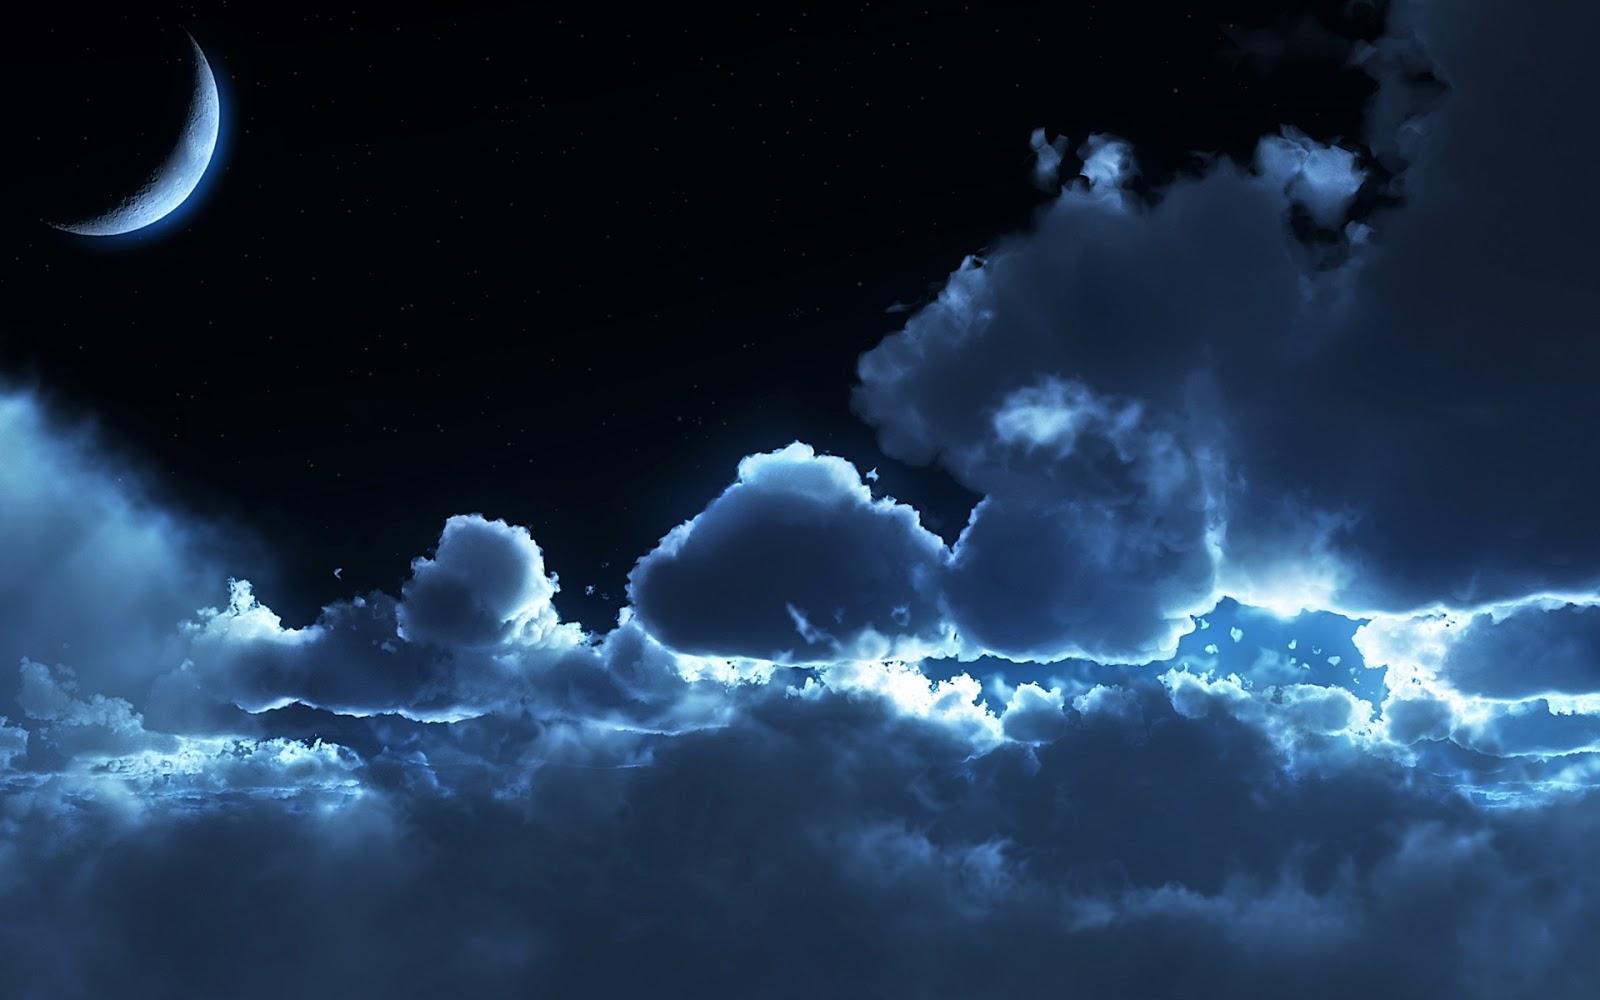 Beautiful Wallpapers For Desktop sky cloud wallpapers hd 1600x1000